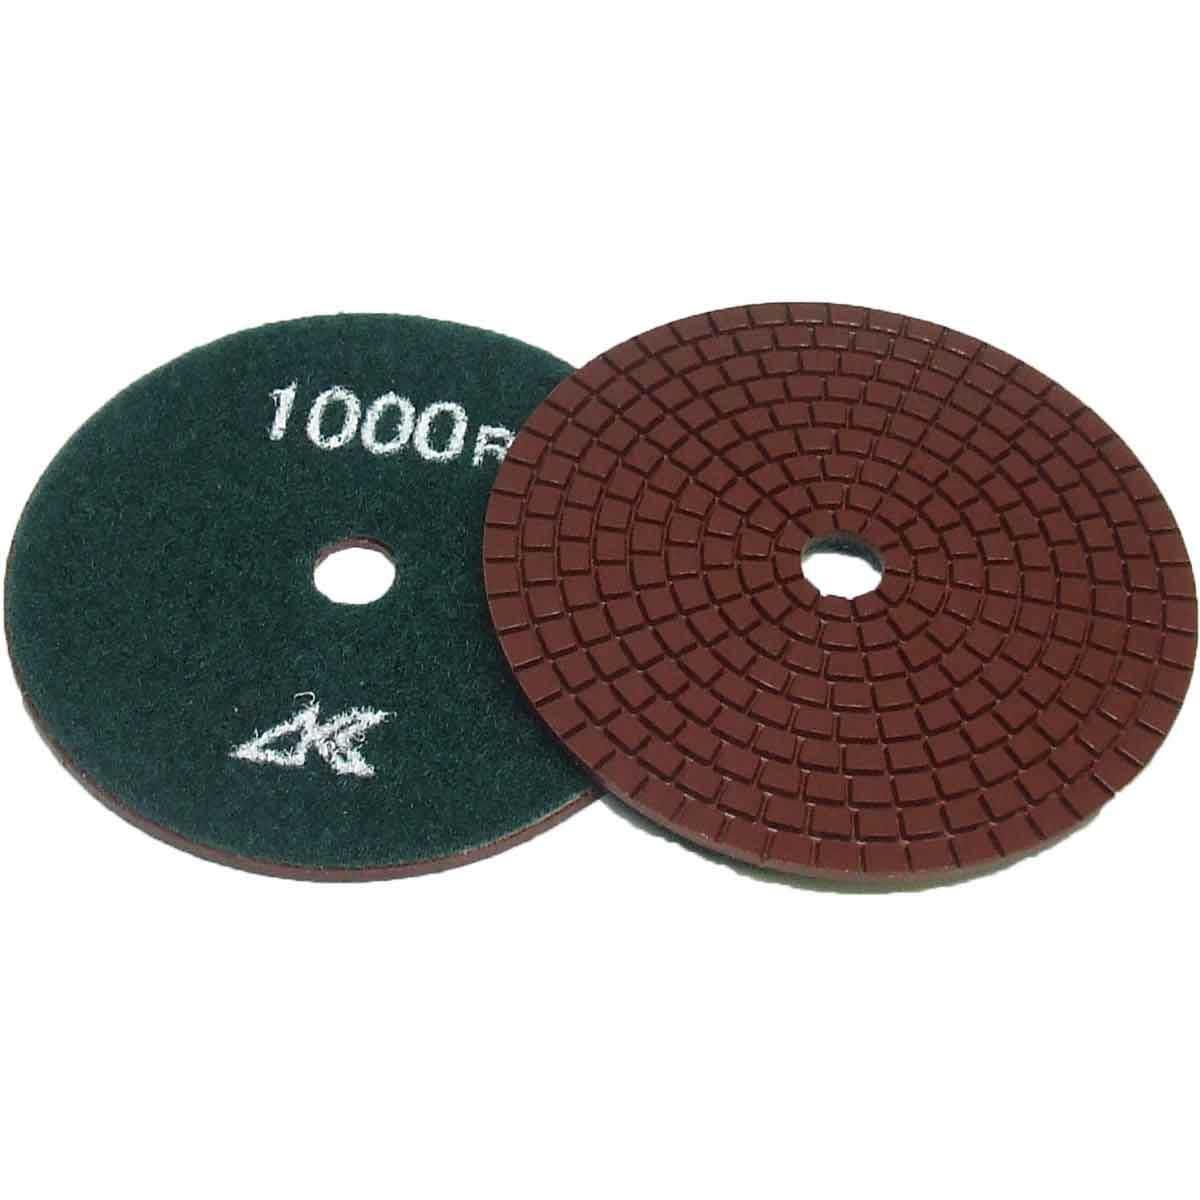 GP41000R 1000 Grit Wet Stone Pads